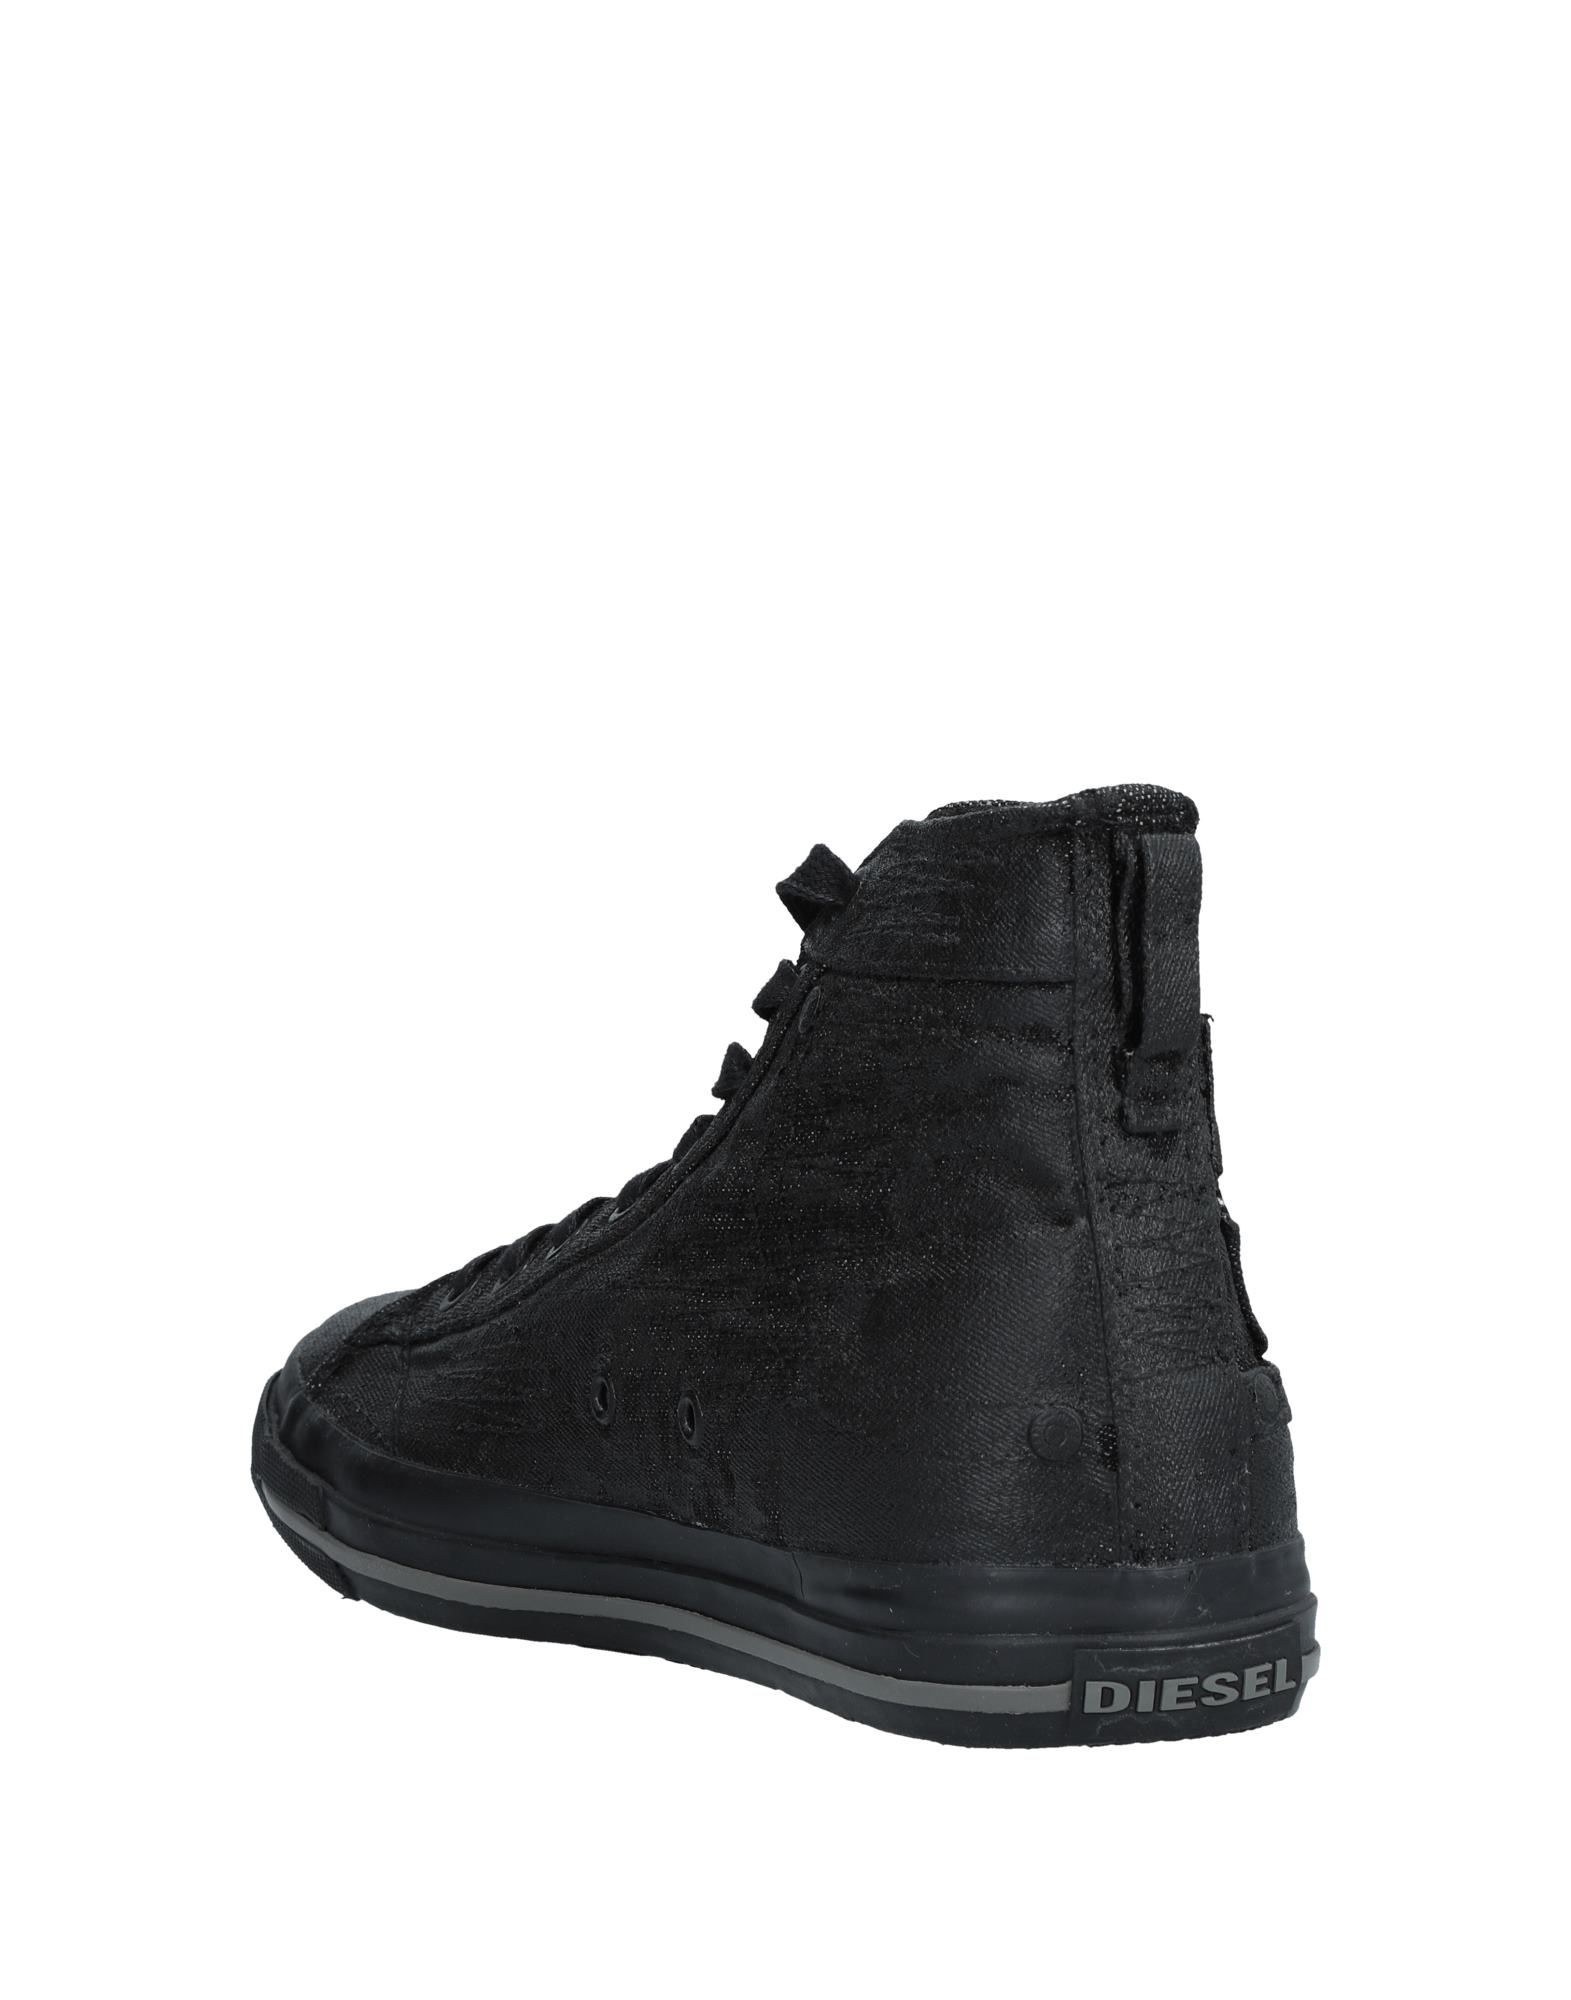 Rabatt echte Schuhe 11533498CC Diesel Sneakers Herren  11533498CC Schuhe 6fd4ff